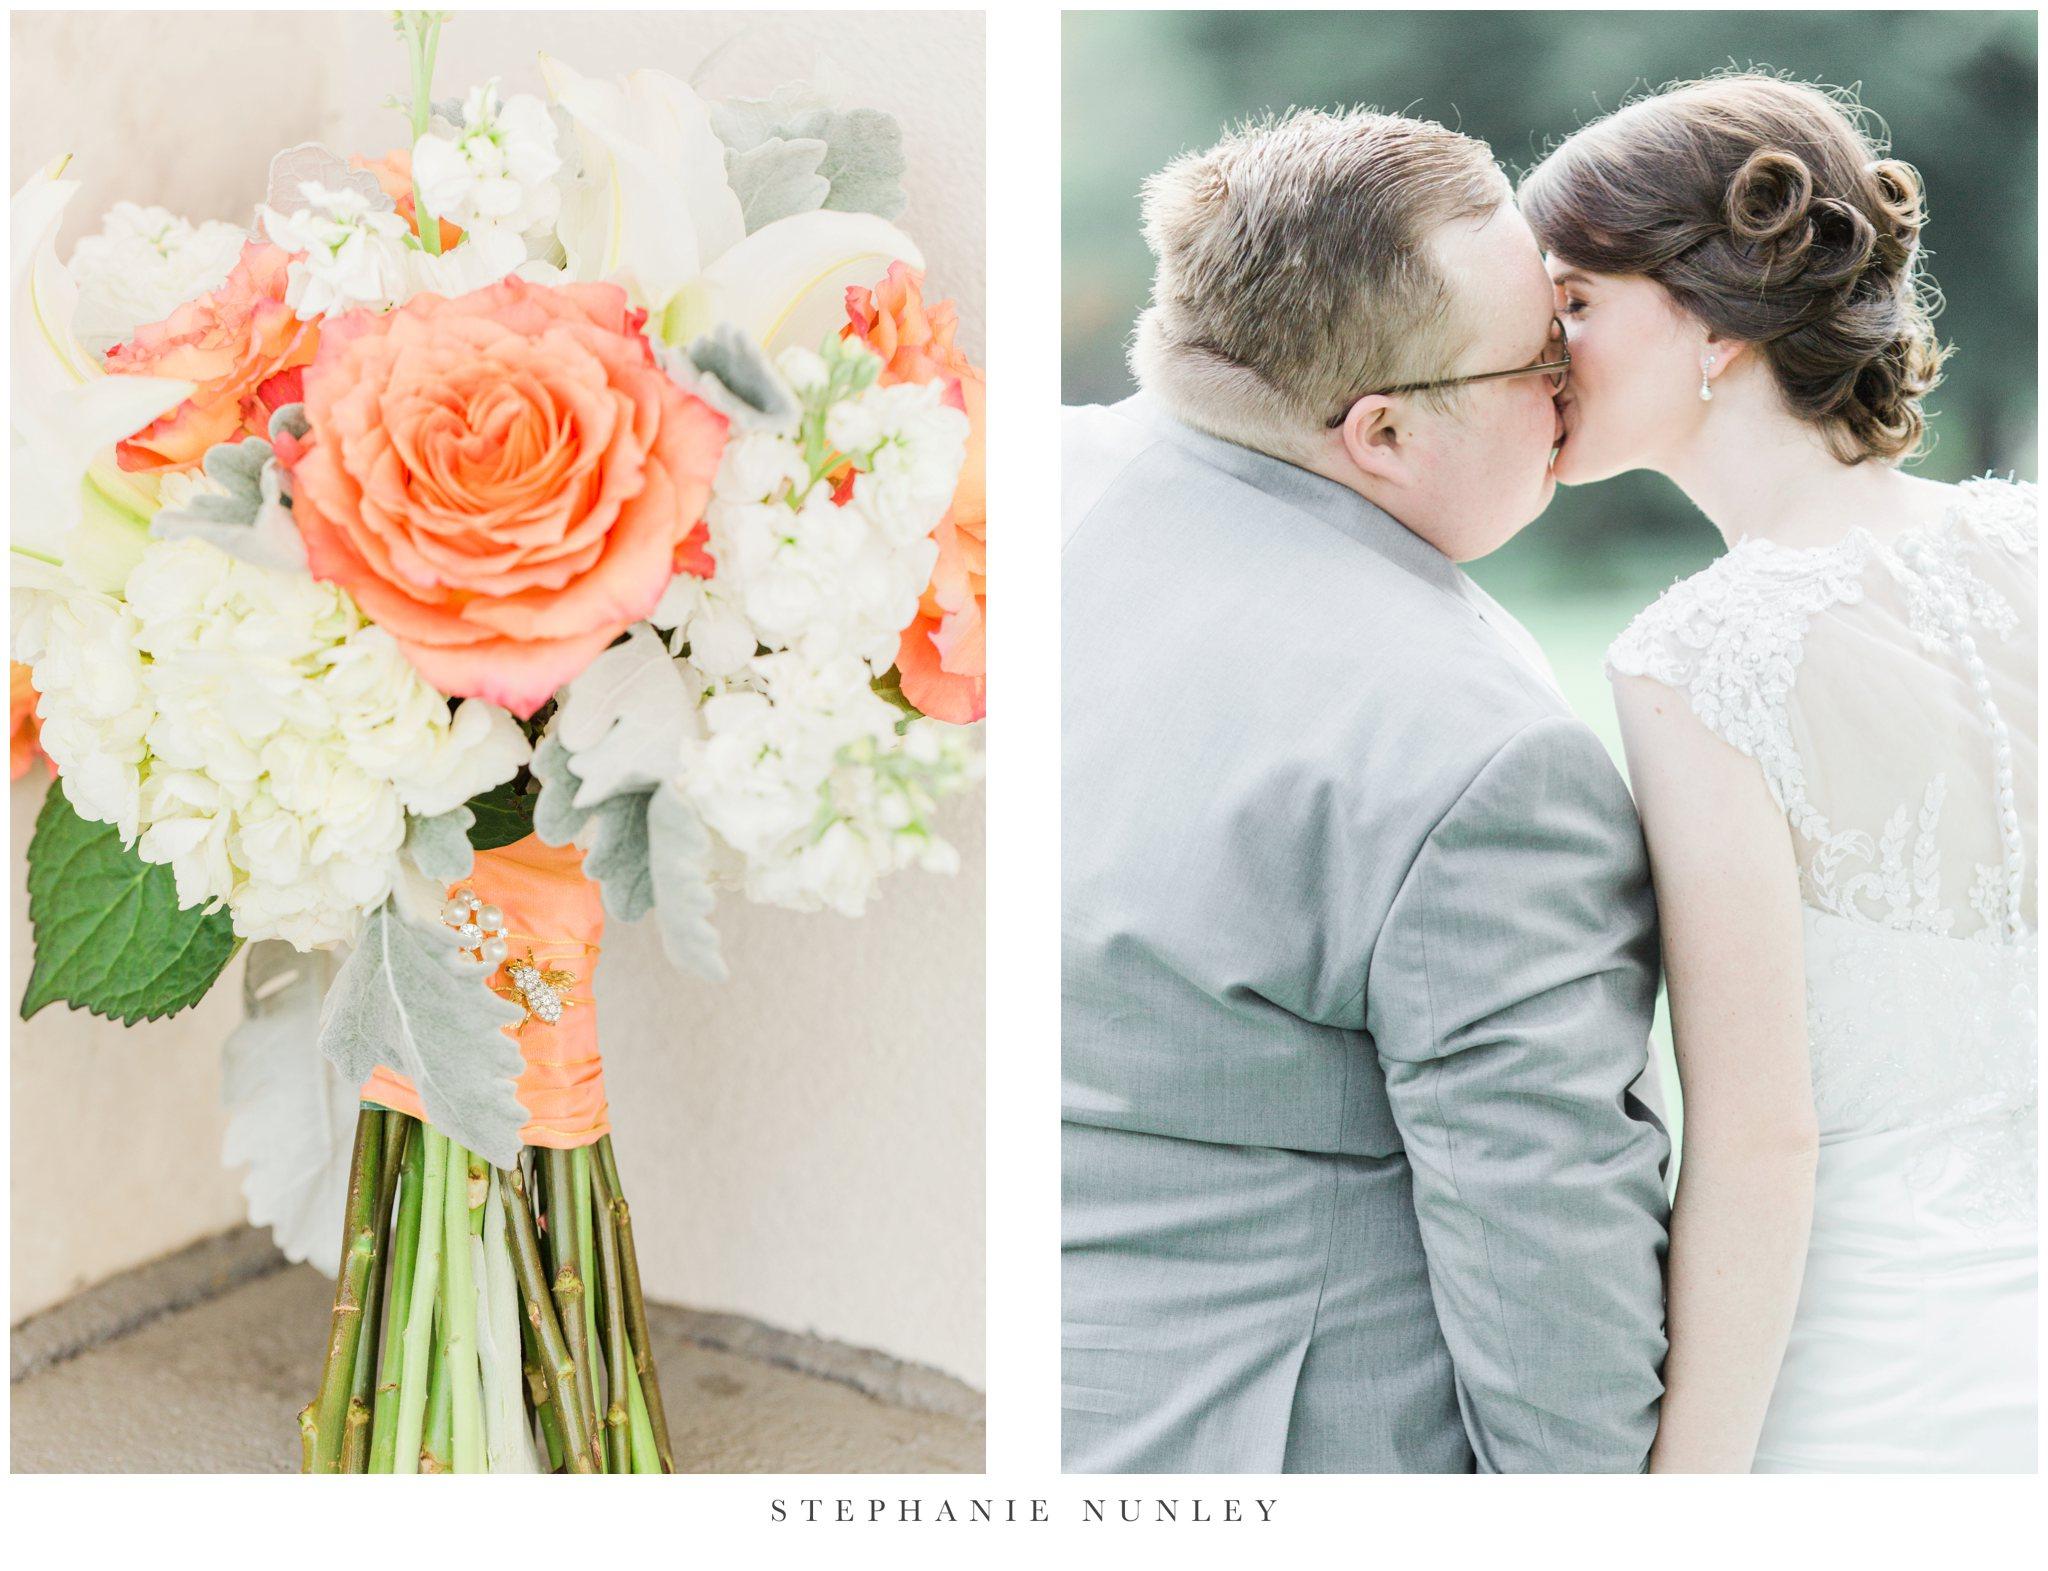 next-level-events-wedding-photos-in-little-rock-0006.jpg